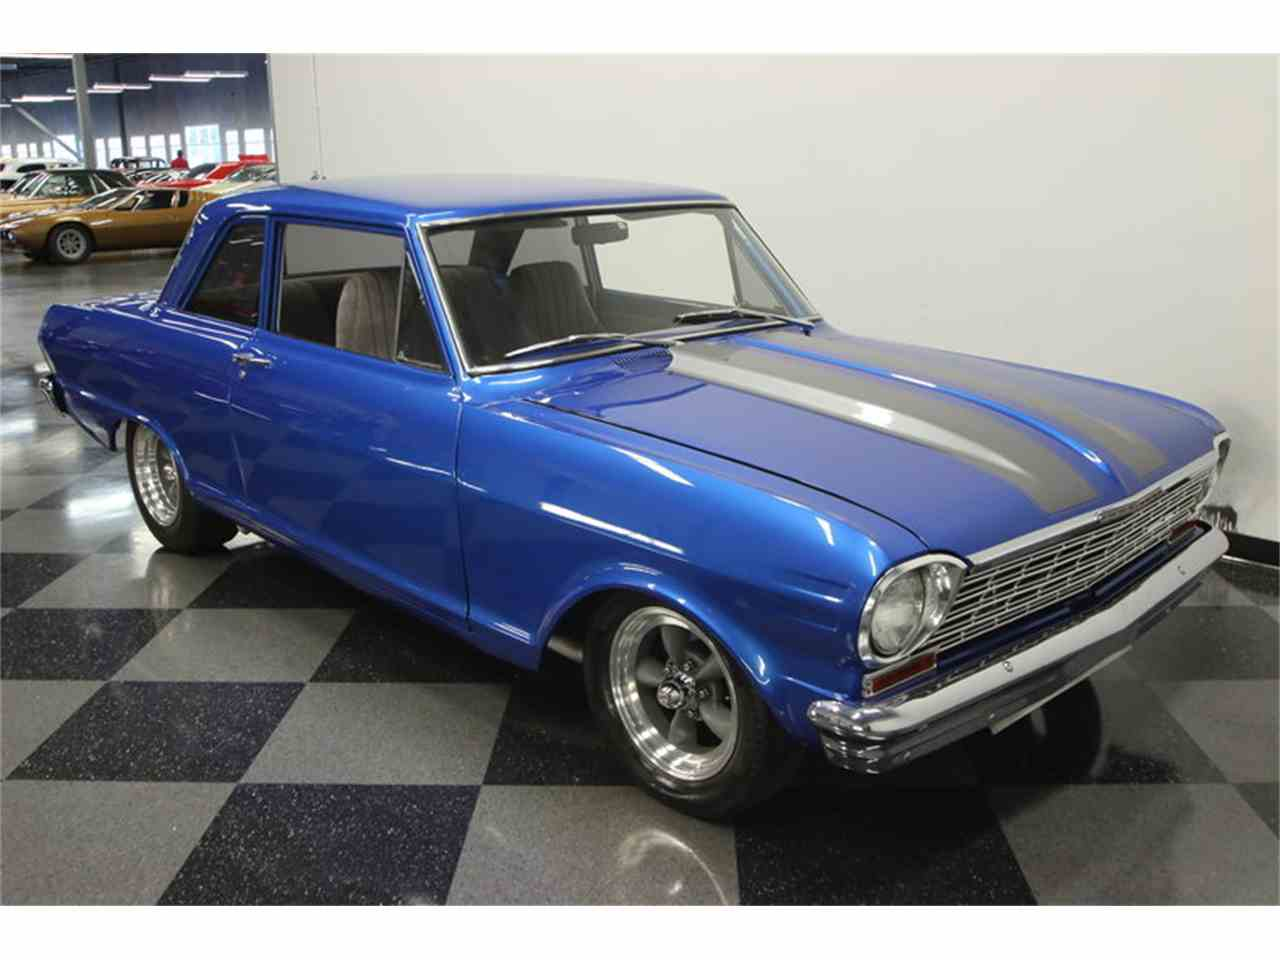 All Chevy 64 chevy ii : 1964 Chevrolet Chevy II Nova Restomod for Sale | ClassicCars.com ...